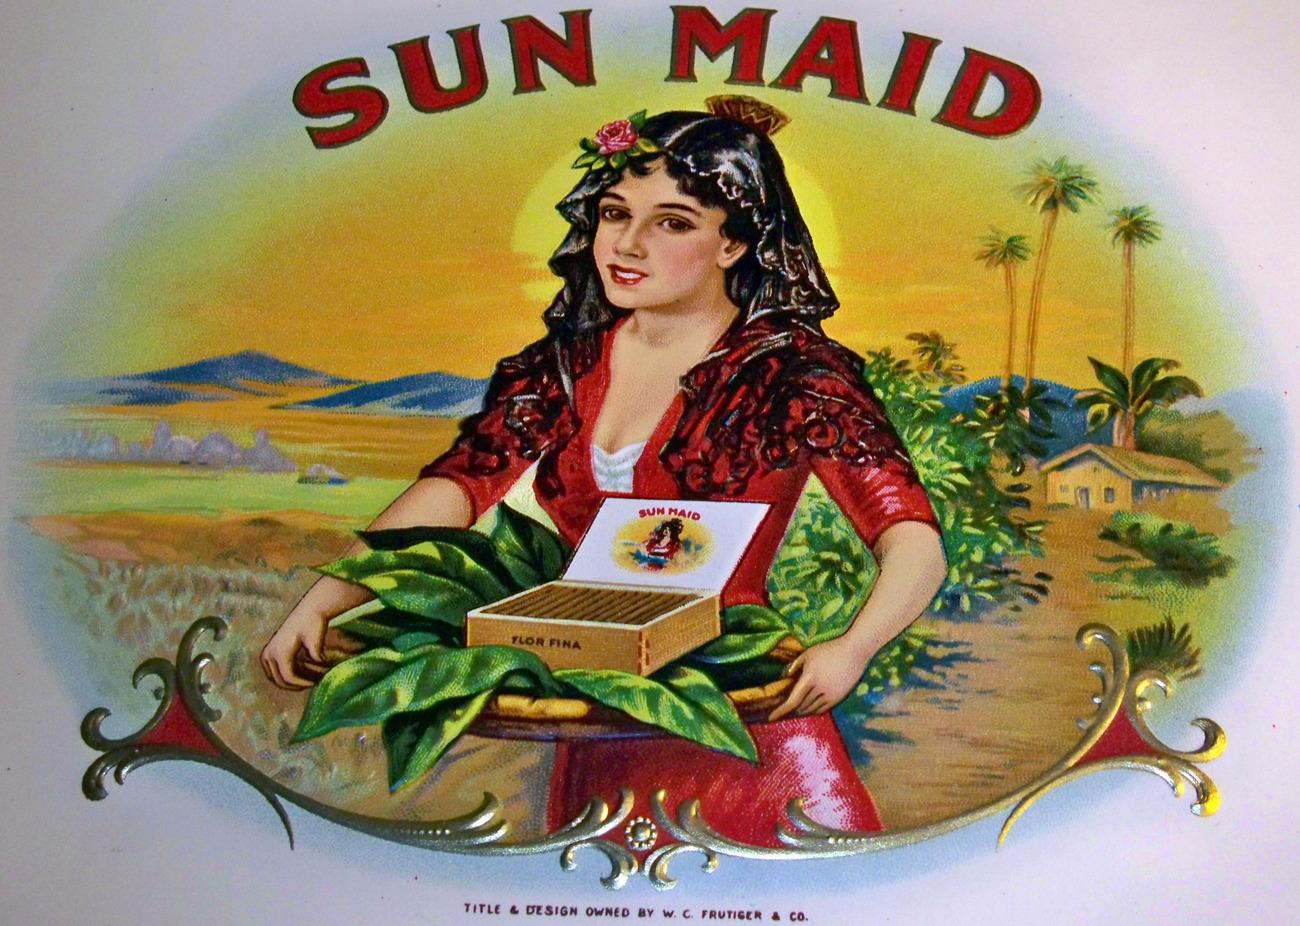 Sun maid cigar labels 002